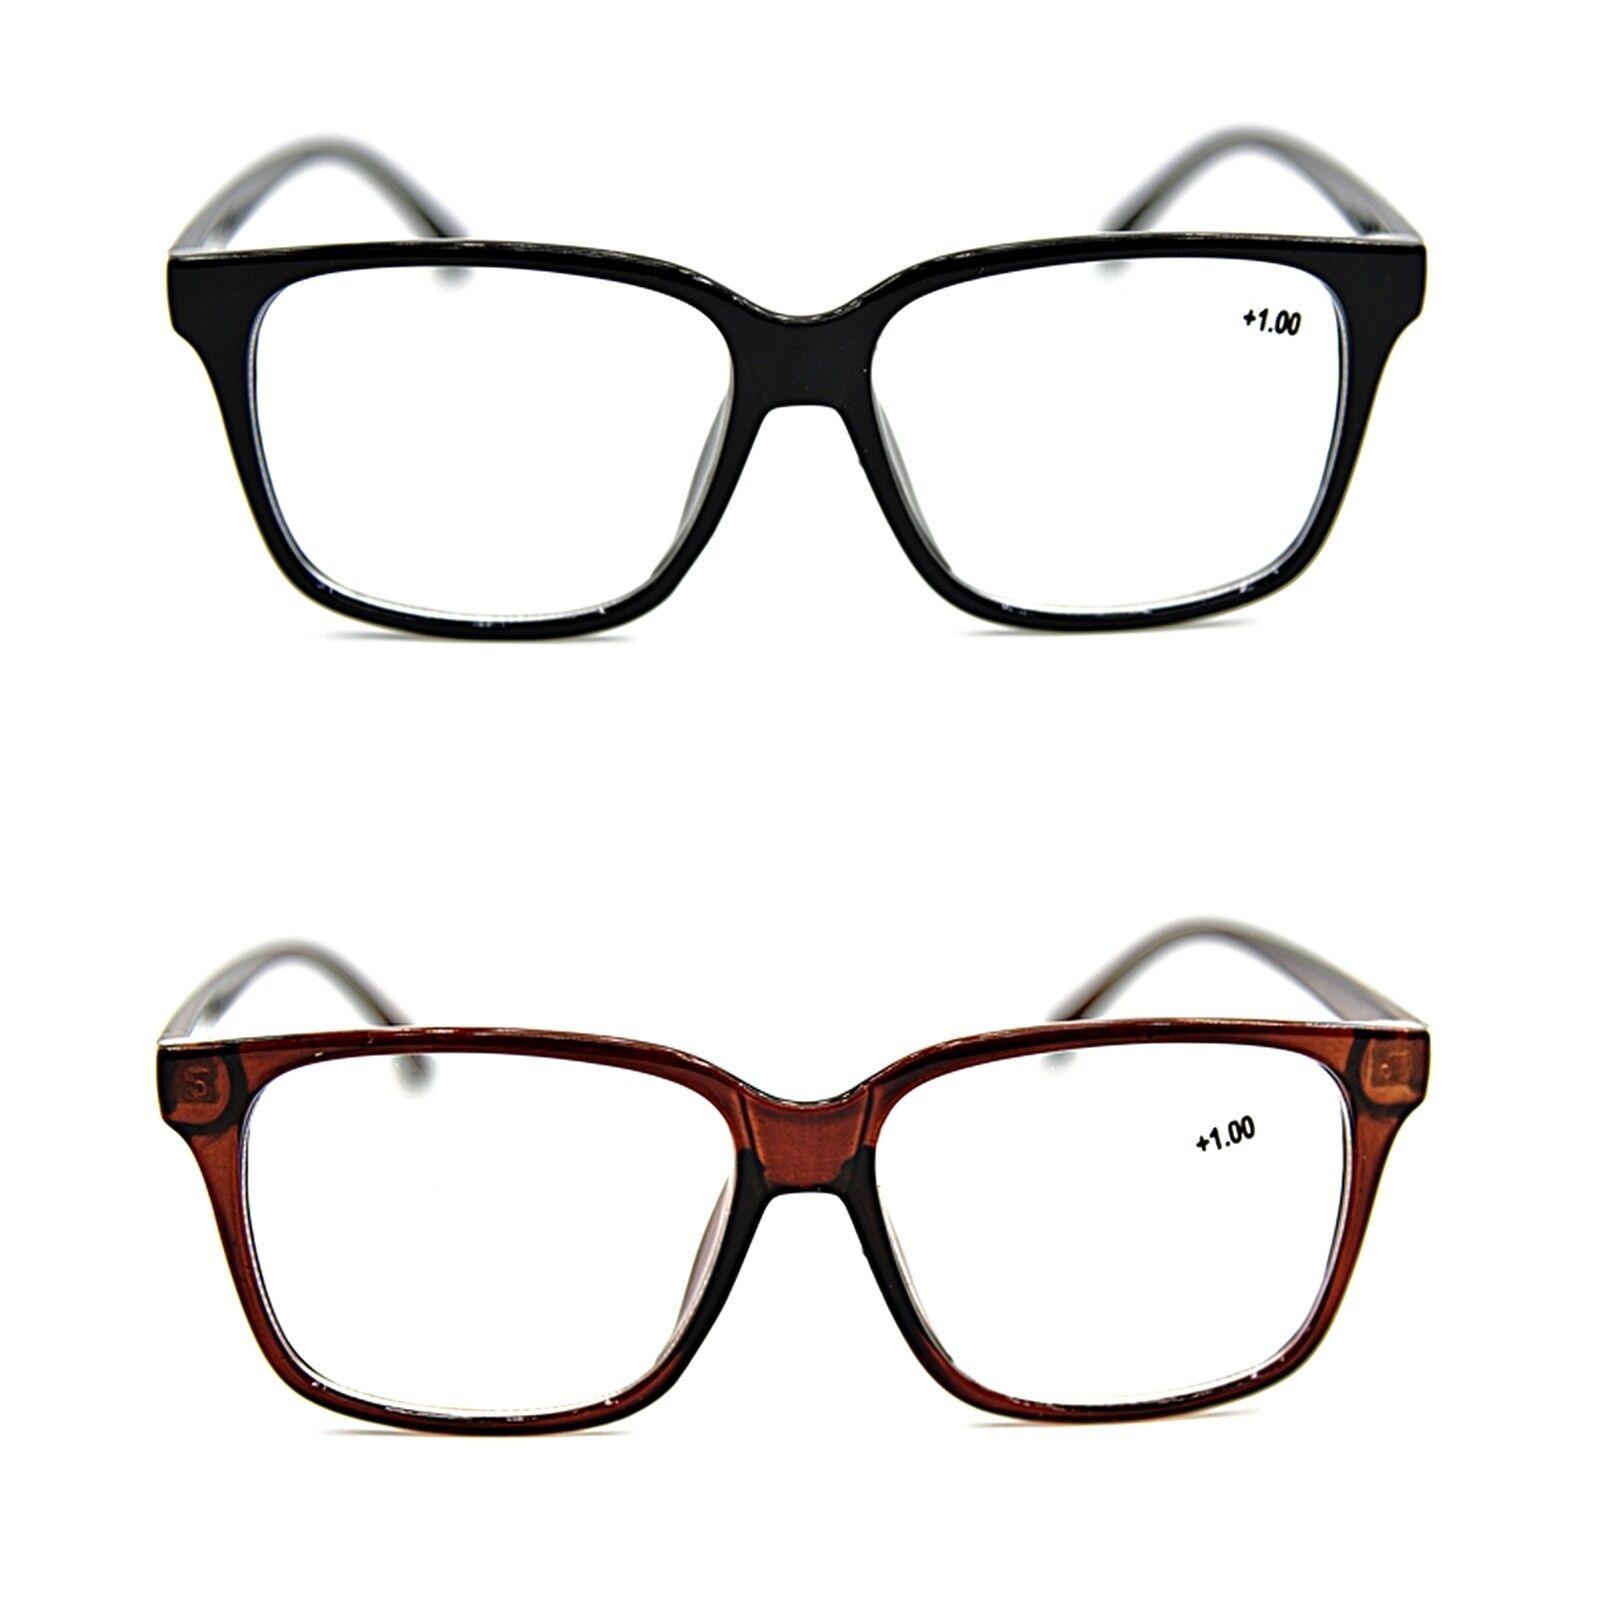 c4112dcbe576 Bifocal Large Unisex Stylish Reading Glasses in 2 Colours+1.0+1.5+2.0+2.5  DX2